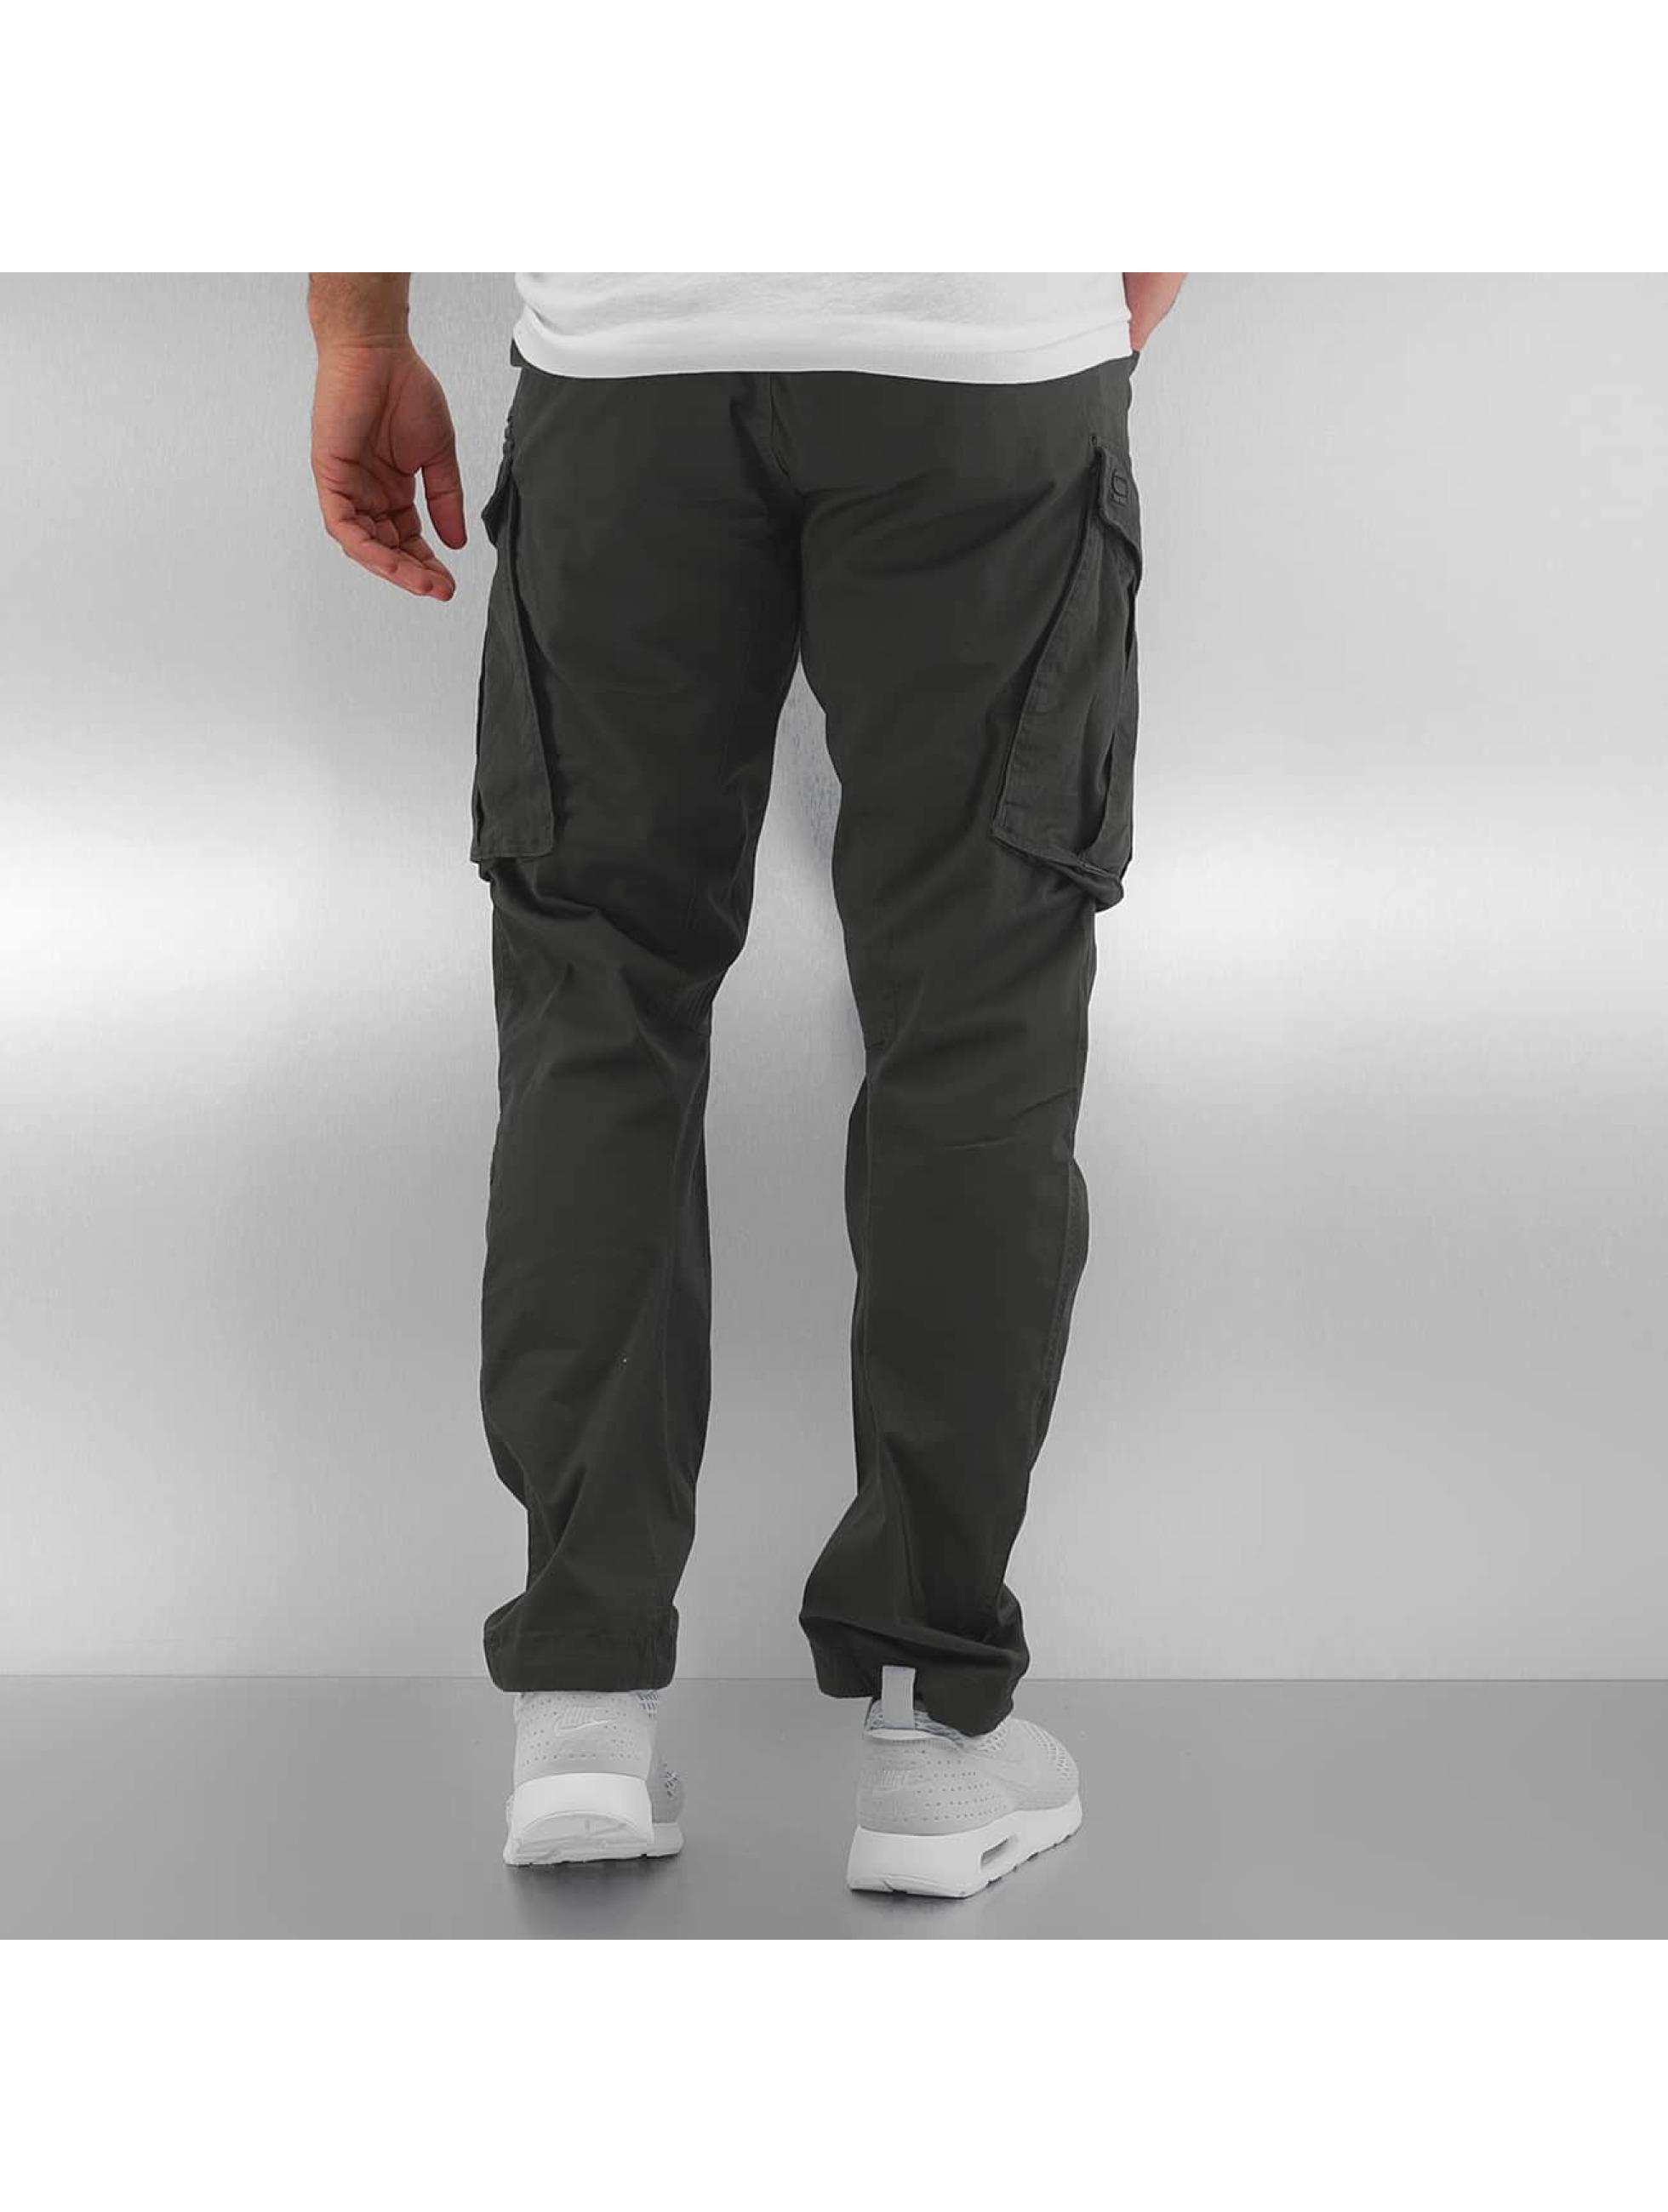 G-Star Spodnie Chino/Cargo Rovic Zip 3D Tapered szary